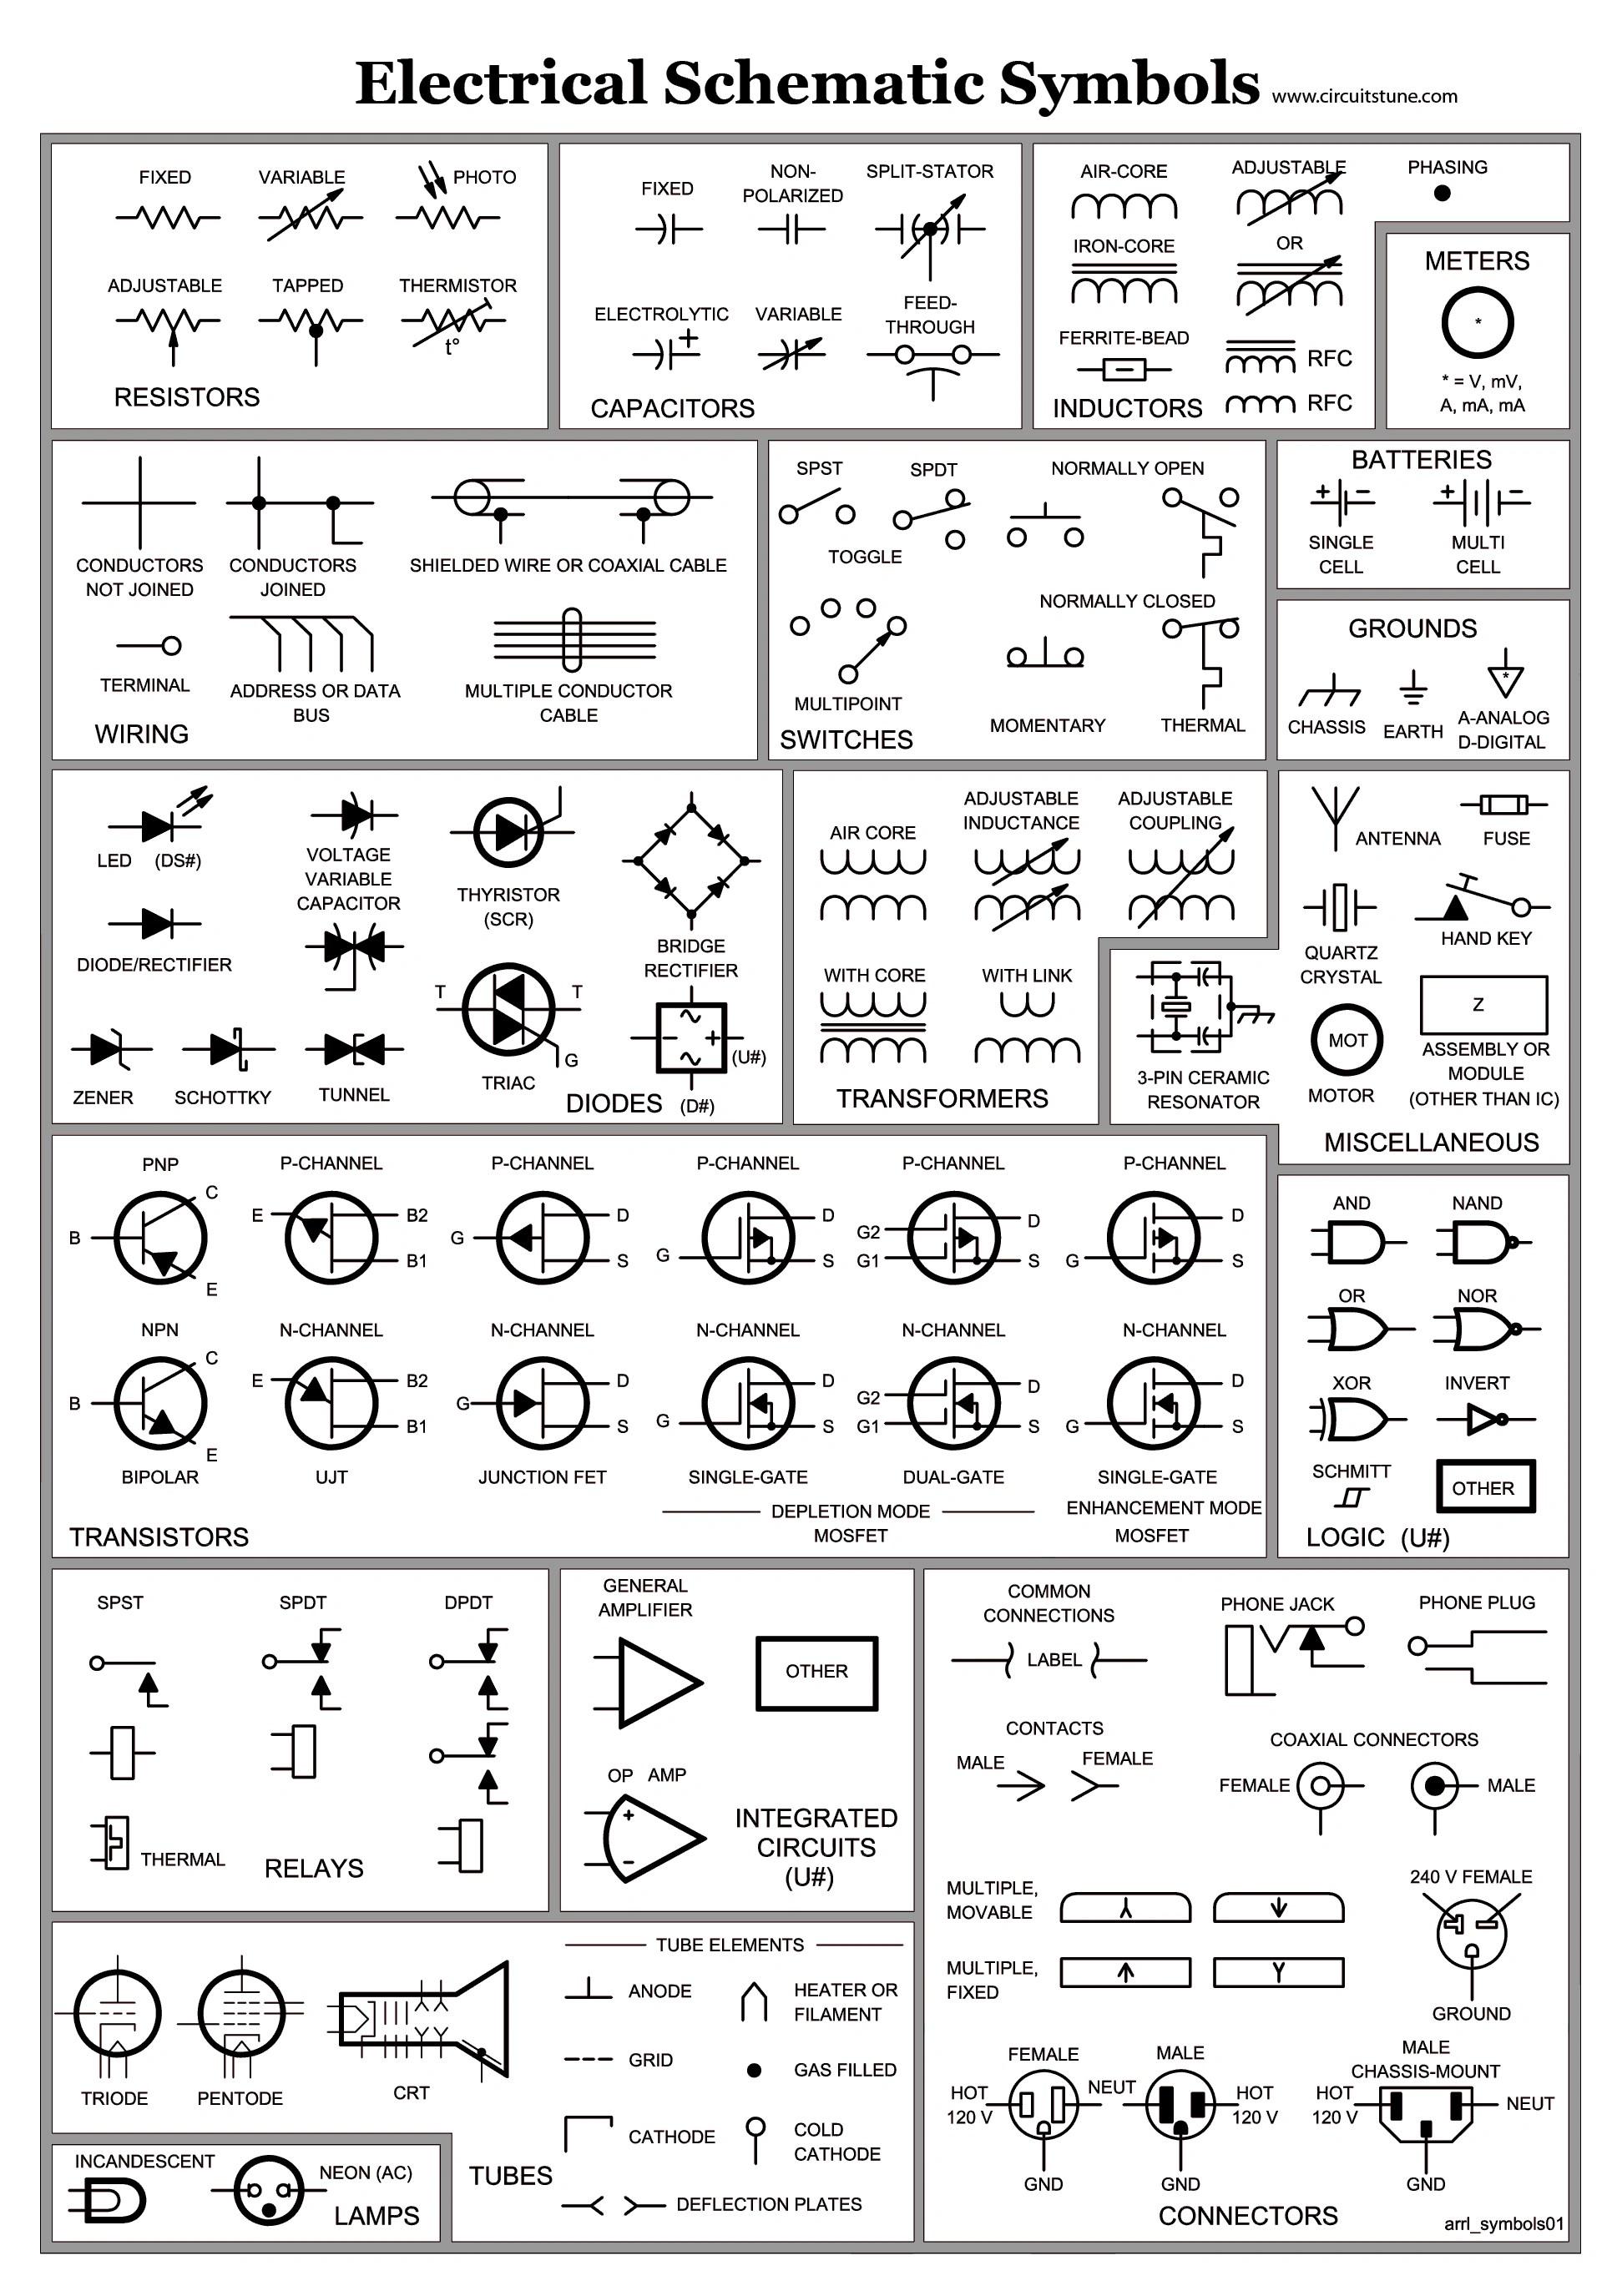 circuit diagram key just wiring diagram wiring diagram rj45 keystone jack circuit diagram key wiring diagram [ 1937 x 2751 Pixel ]